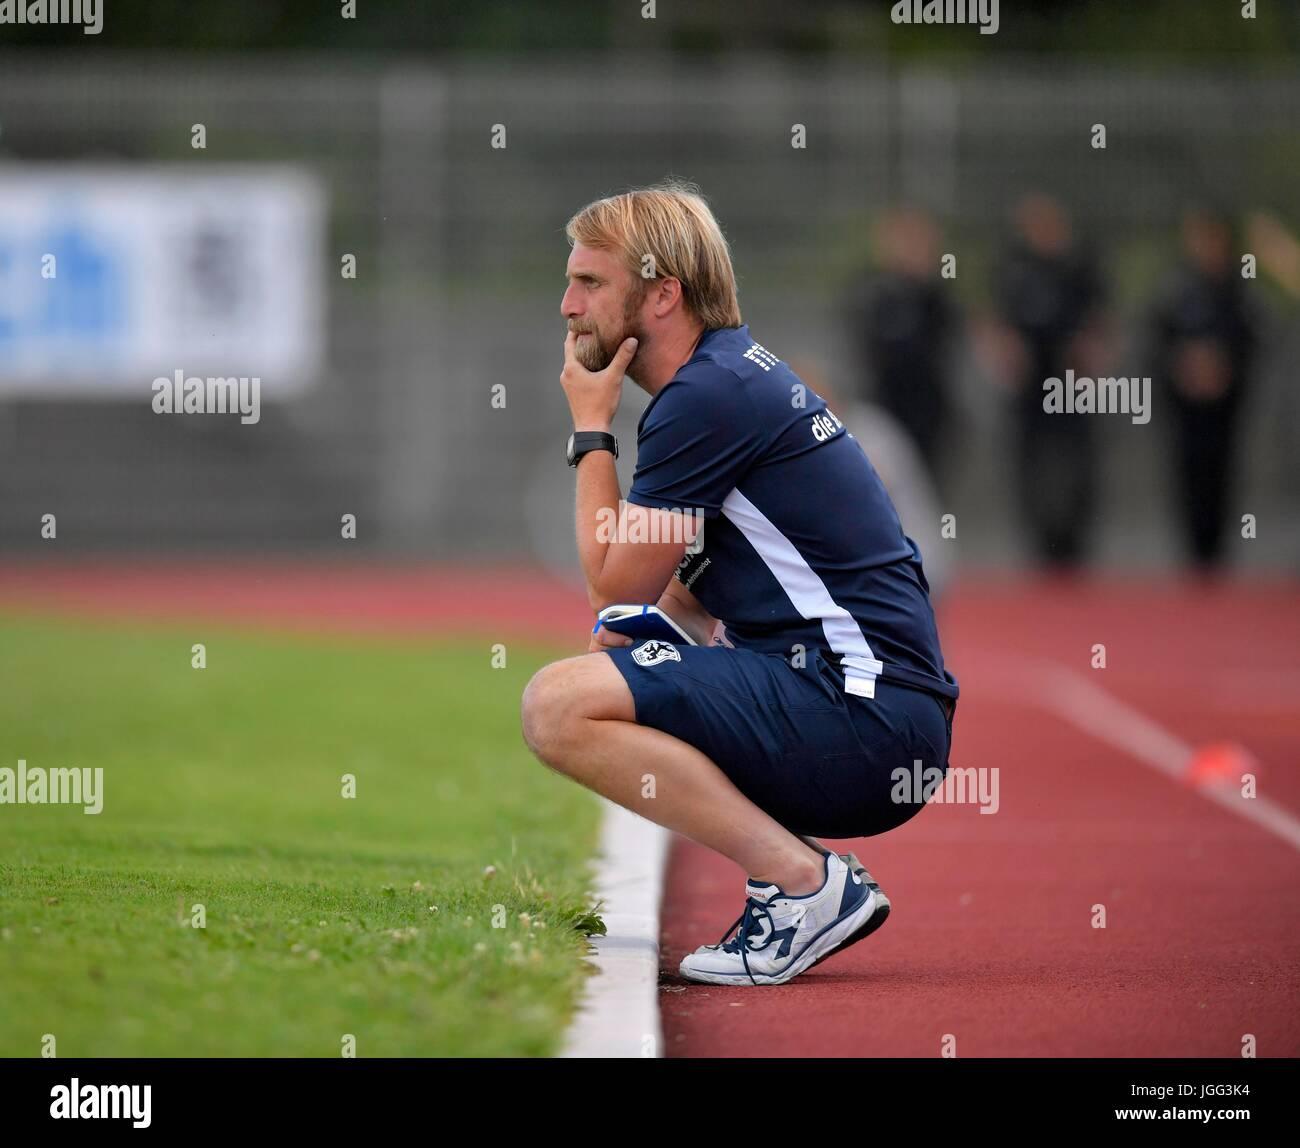 Regionalliga Stockfotos & Regionalliga Bilder - Alamy